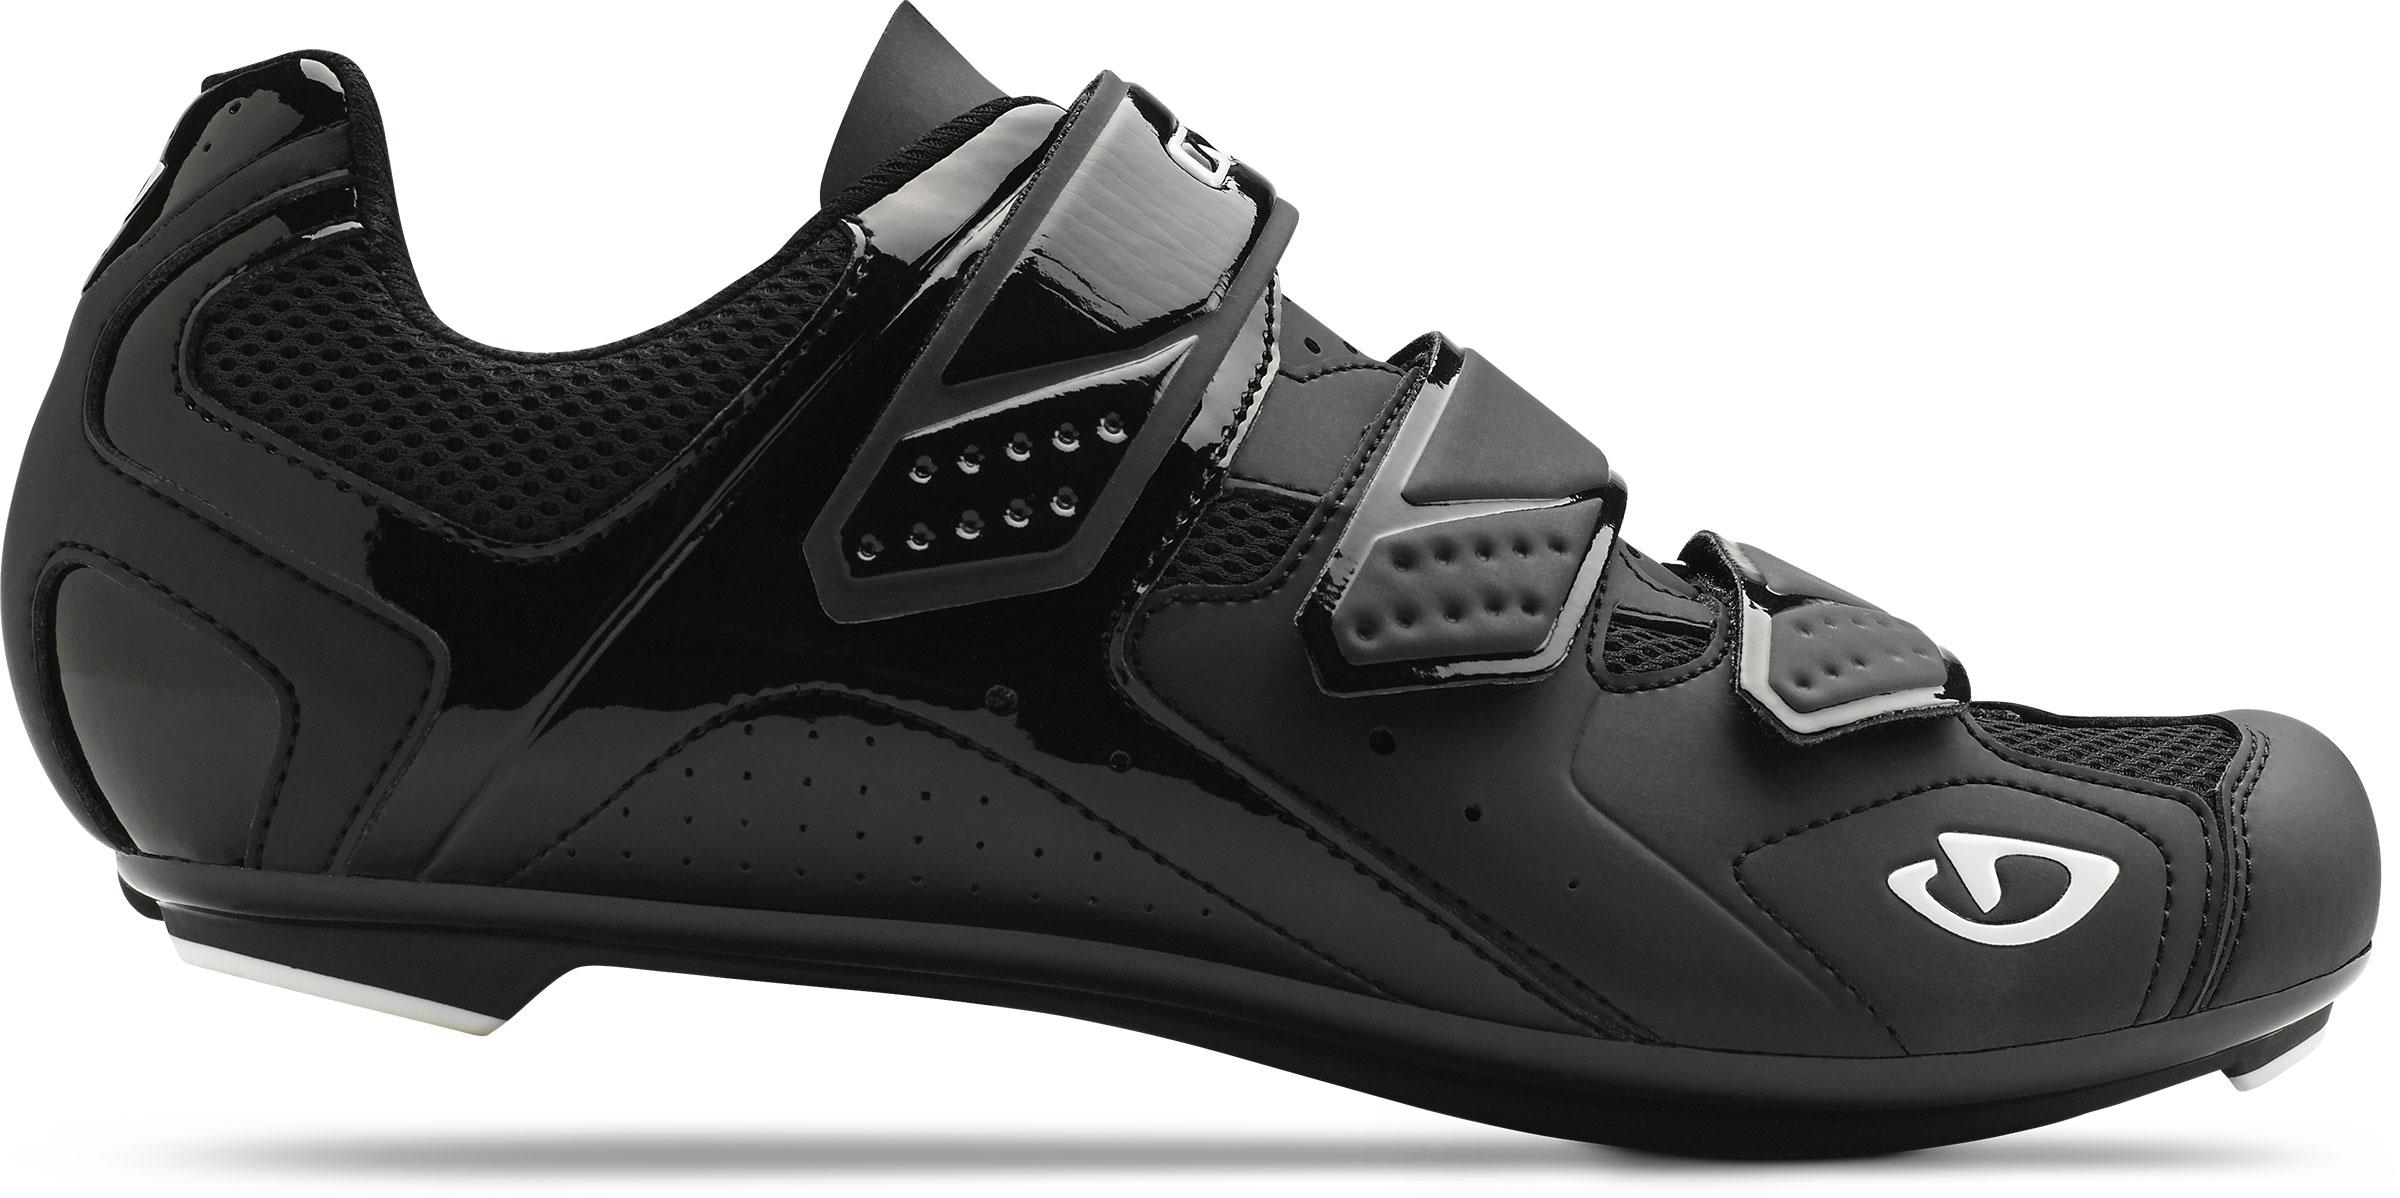 Giro Treble II Shoes - Pedal Bike Shop